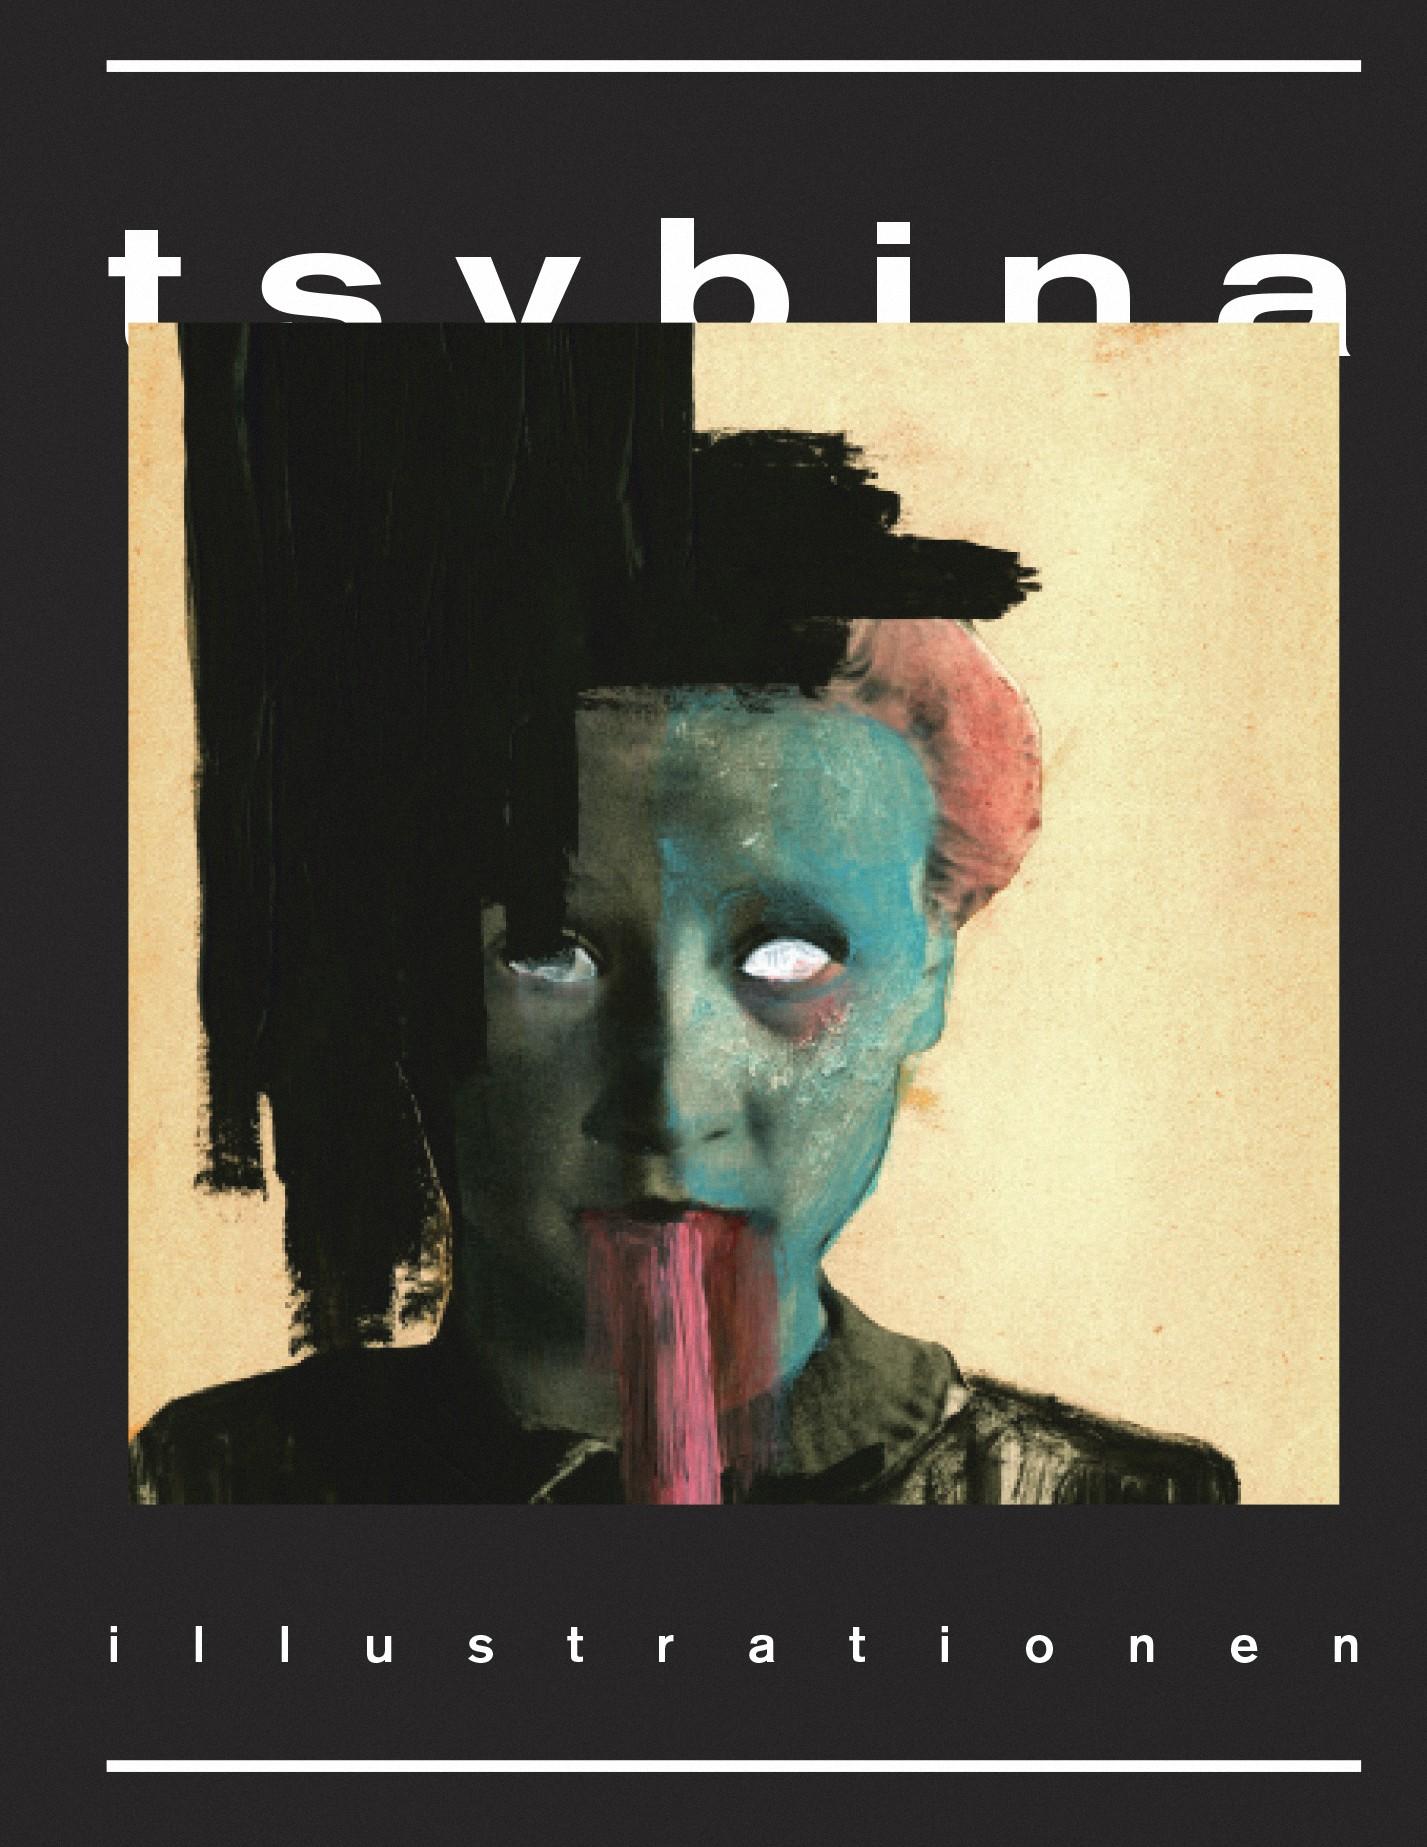 Cover | Broschüre | Portfolio | Künstlerin | Illustrationen